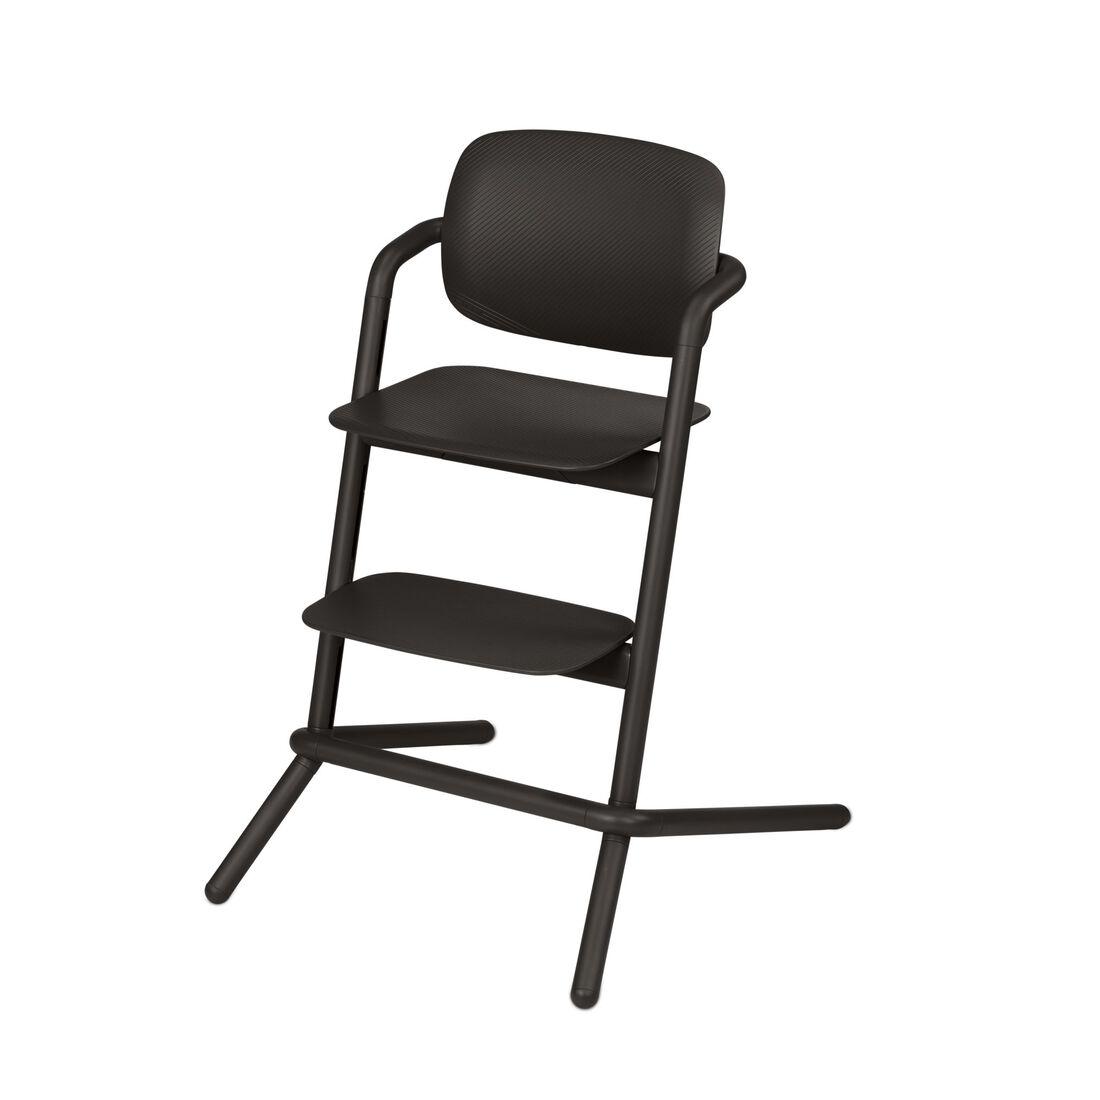 CYBEX Lemo Chair - Infinity Black (Plastic) in Infinity Black (Plastic) large image number 1